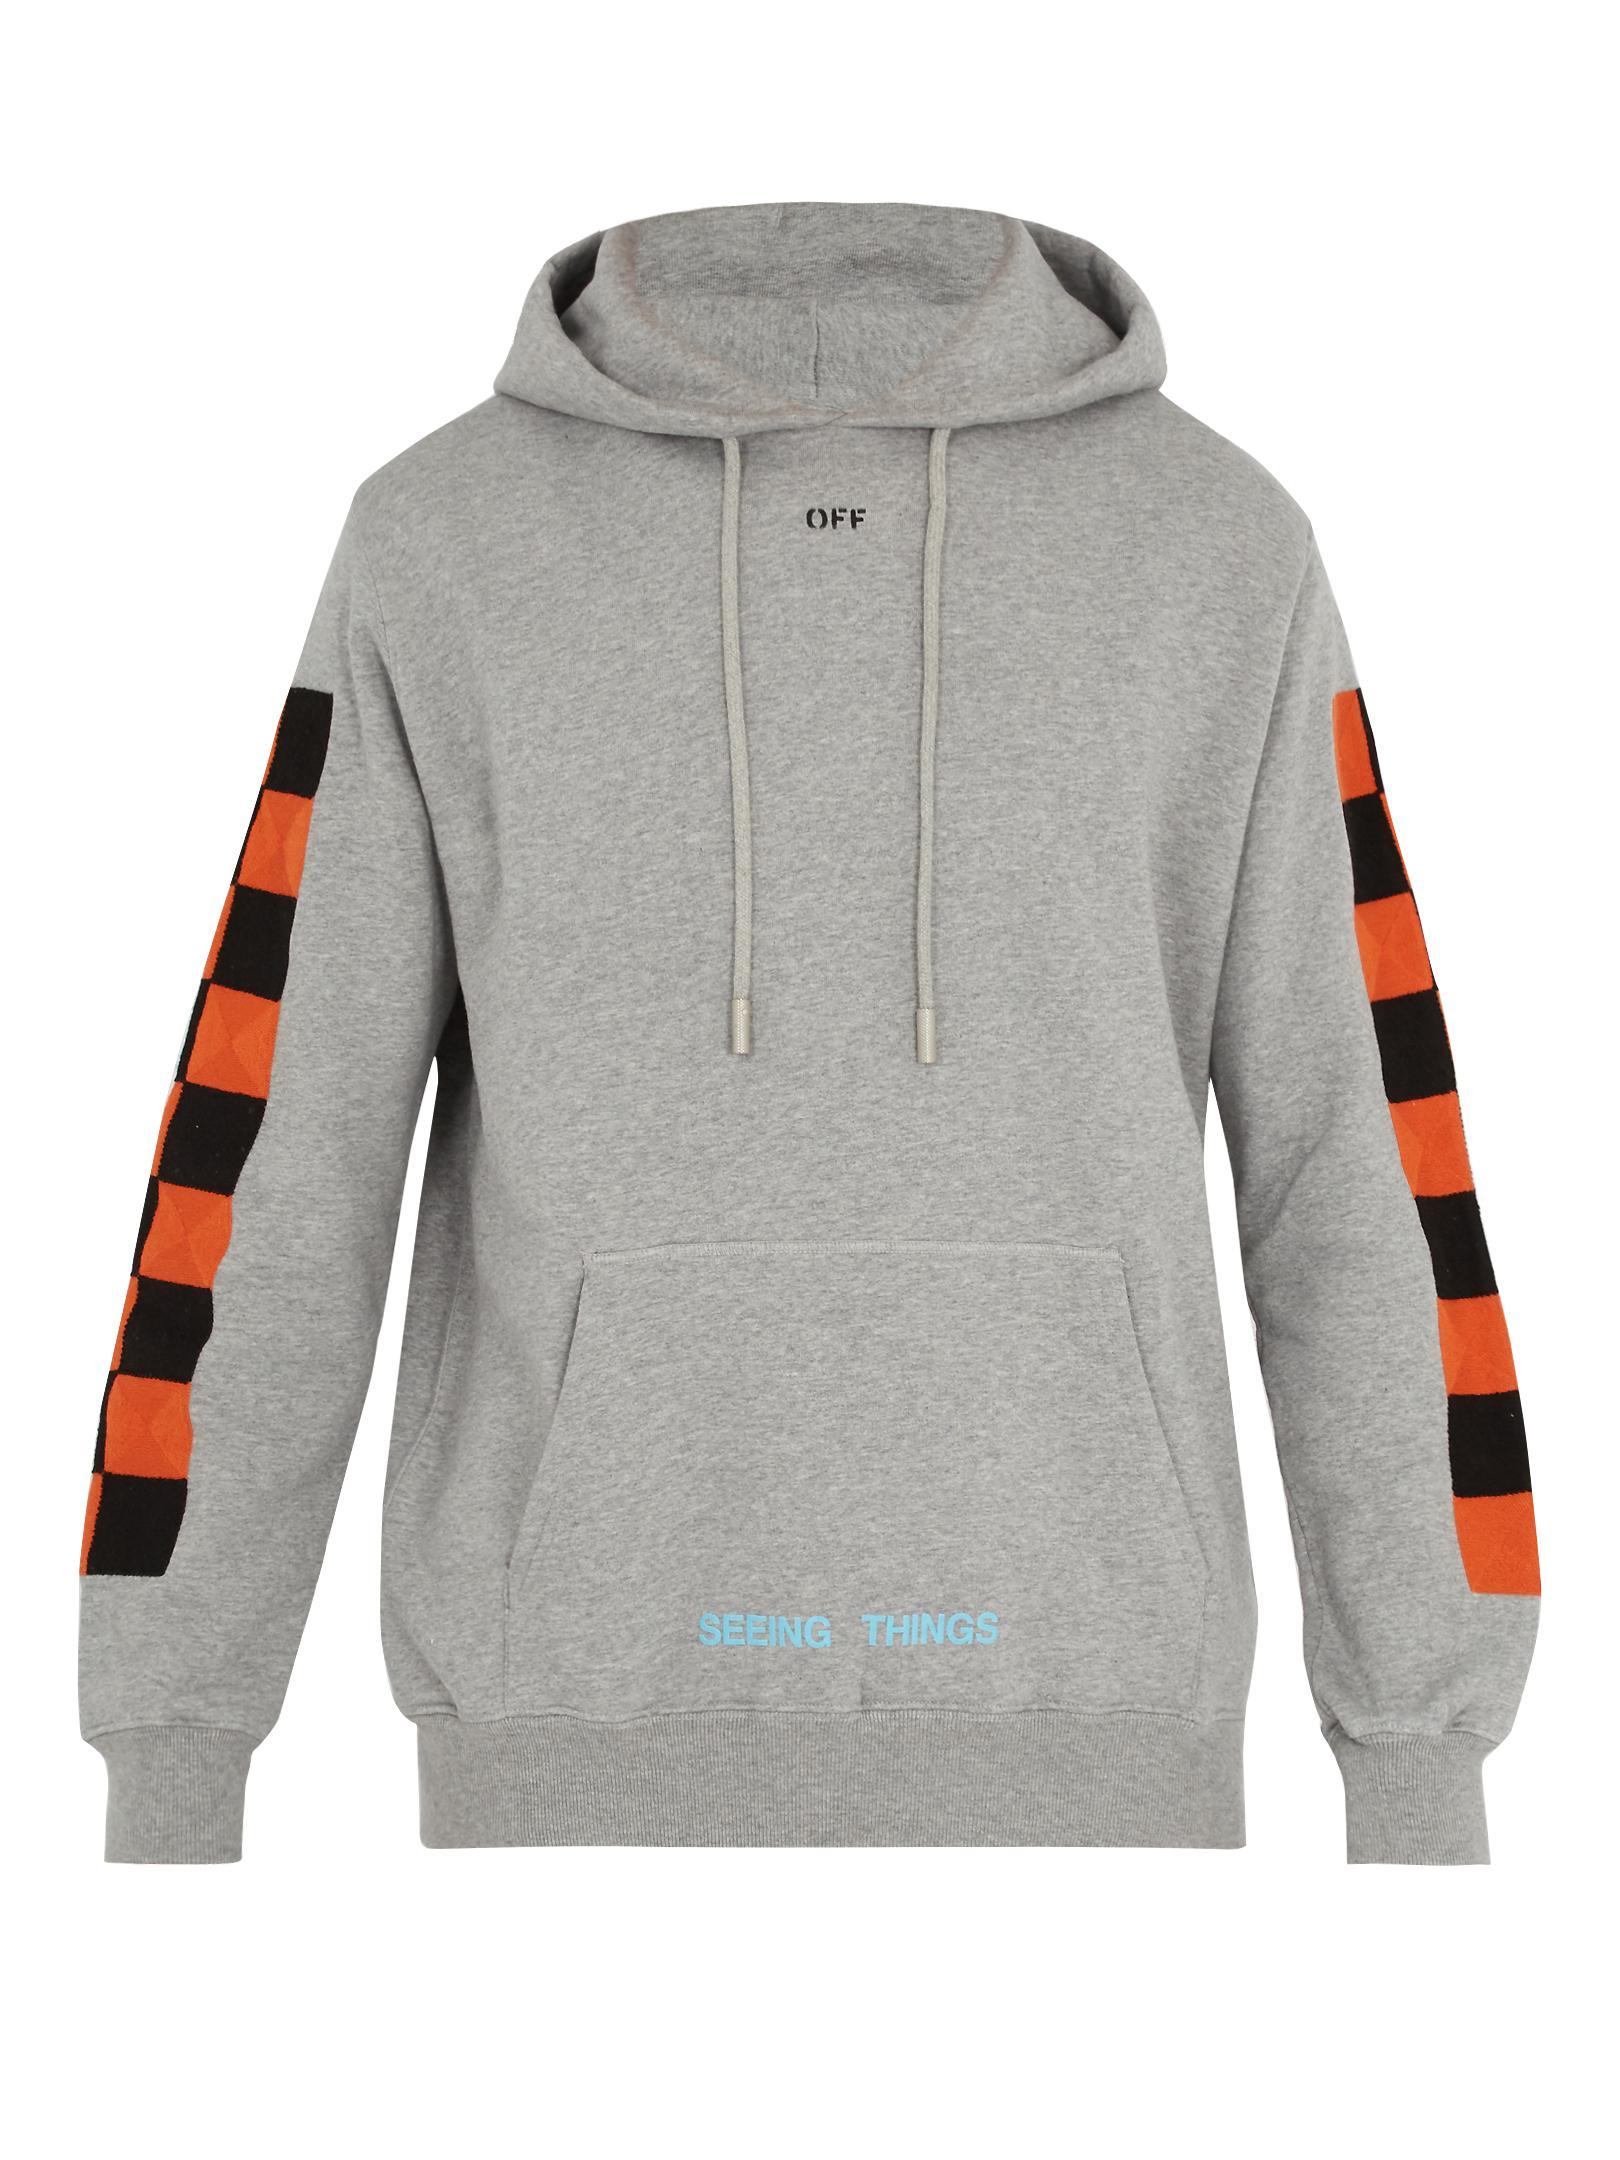 Off-white hooded sweatshirt - Grey